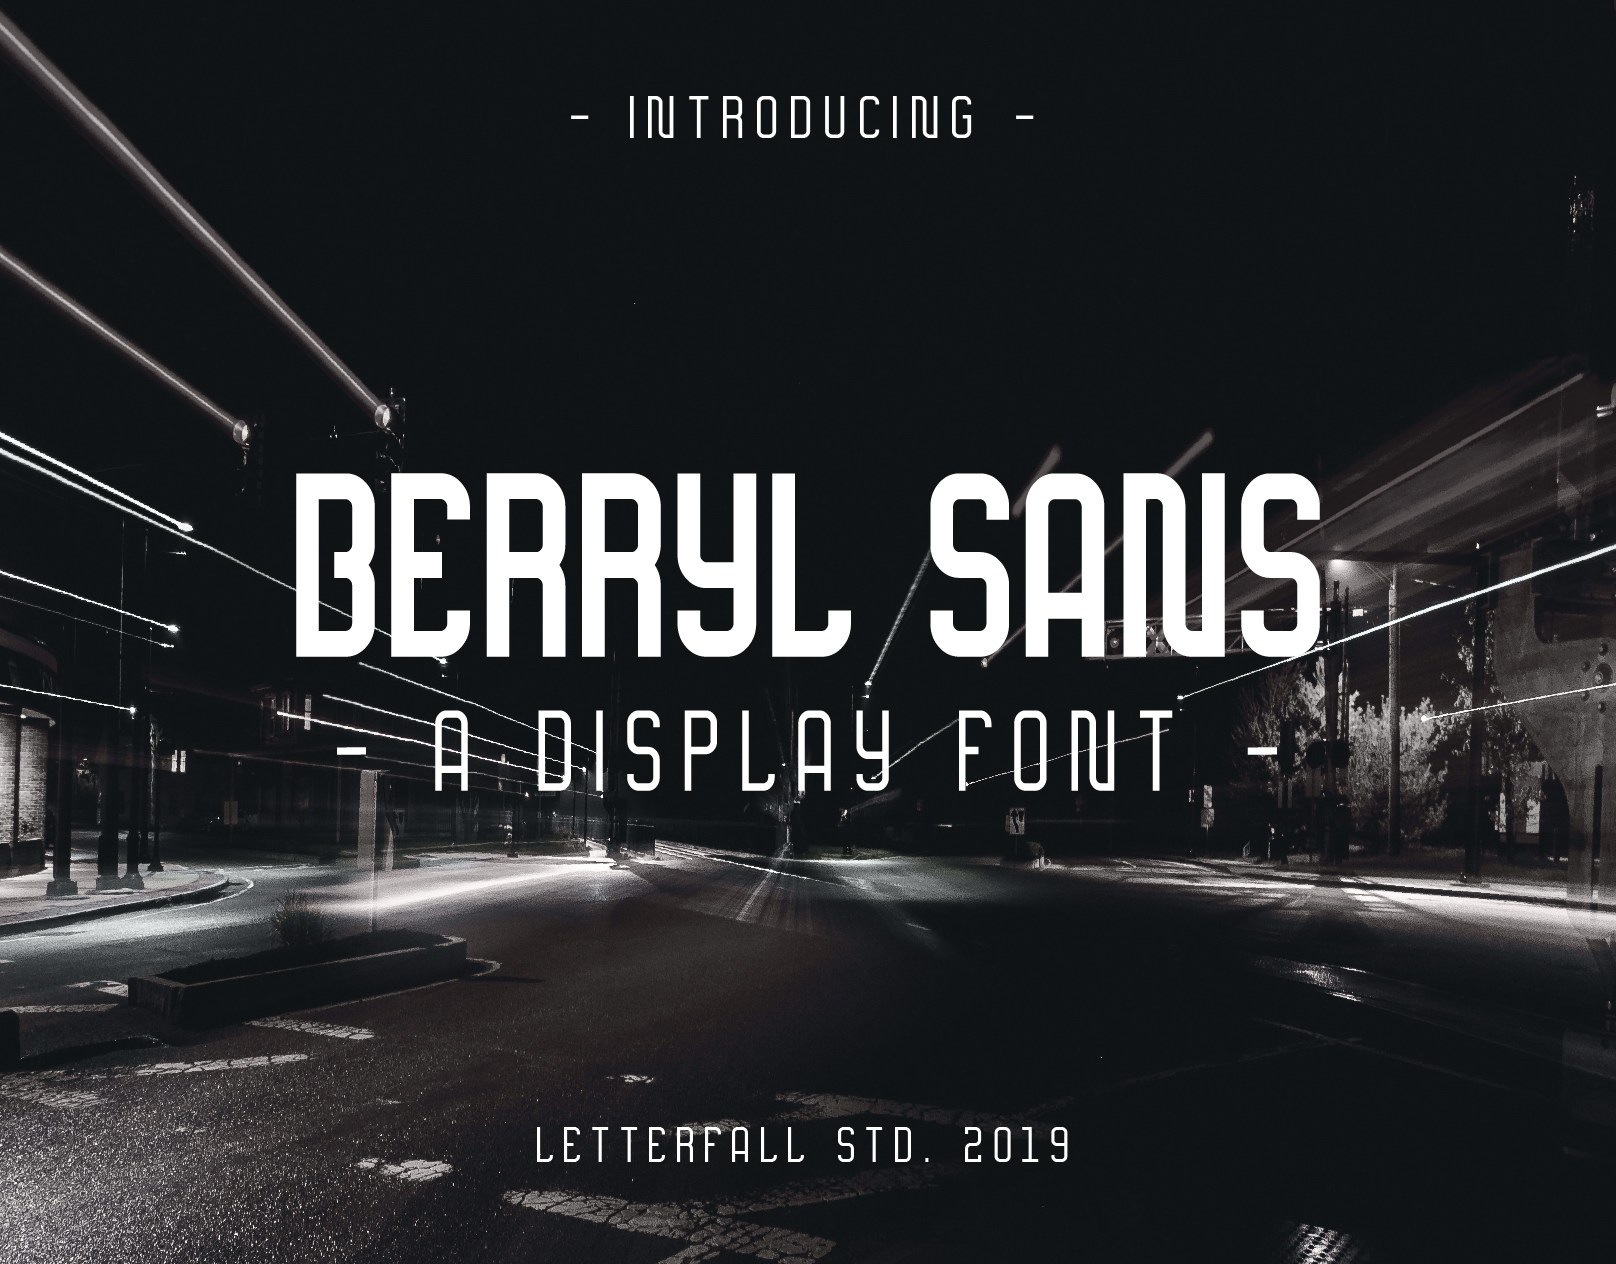 https://fontclarity.com/wp-content/uploads/2019/09/berryl-sans-serif-font-download-0.jpg Free Download